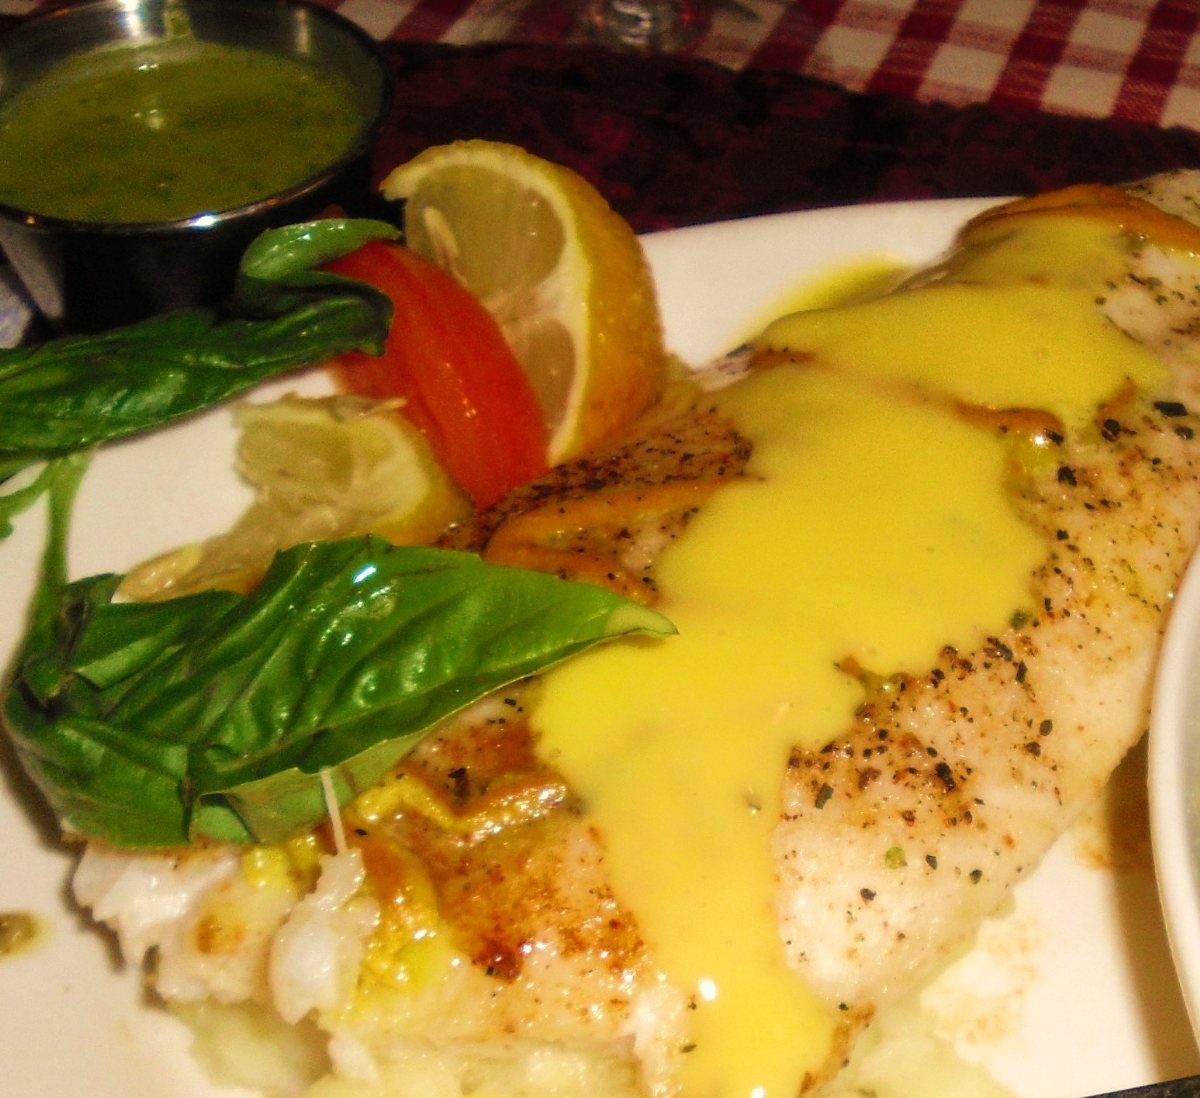 ... Course Main Dish Fish and Shellfish Orange Roughy in Wine Sauce